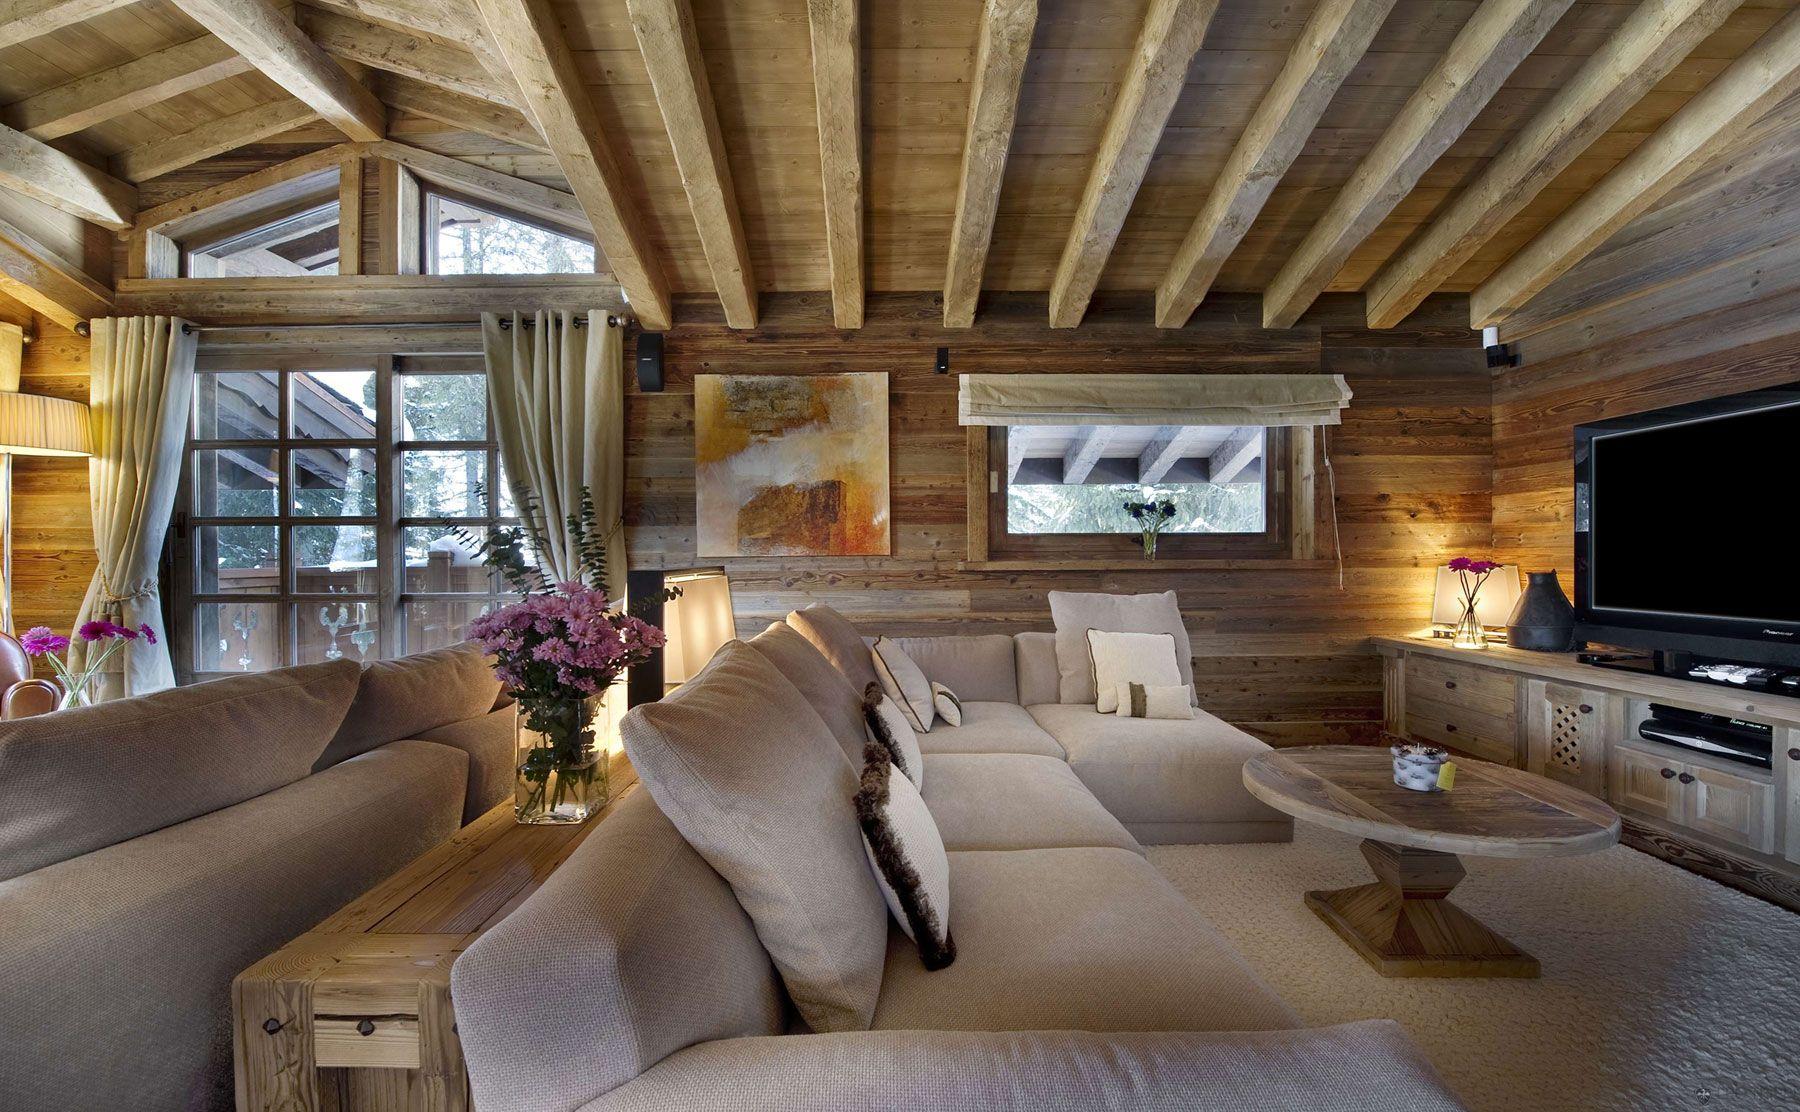 Moderne Innovative Luxus Interieur Ideen Furs Wohnzimmer Weiss Moebelstuecke Idee Design Wohnbereich